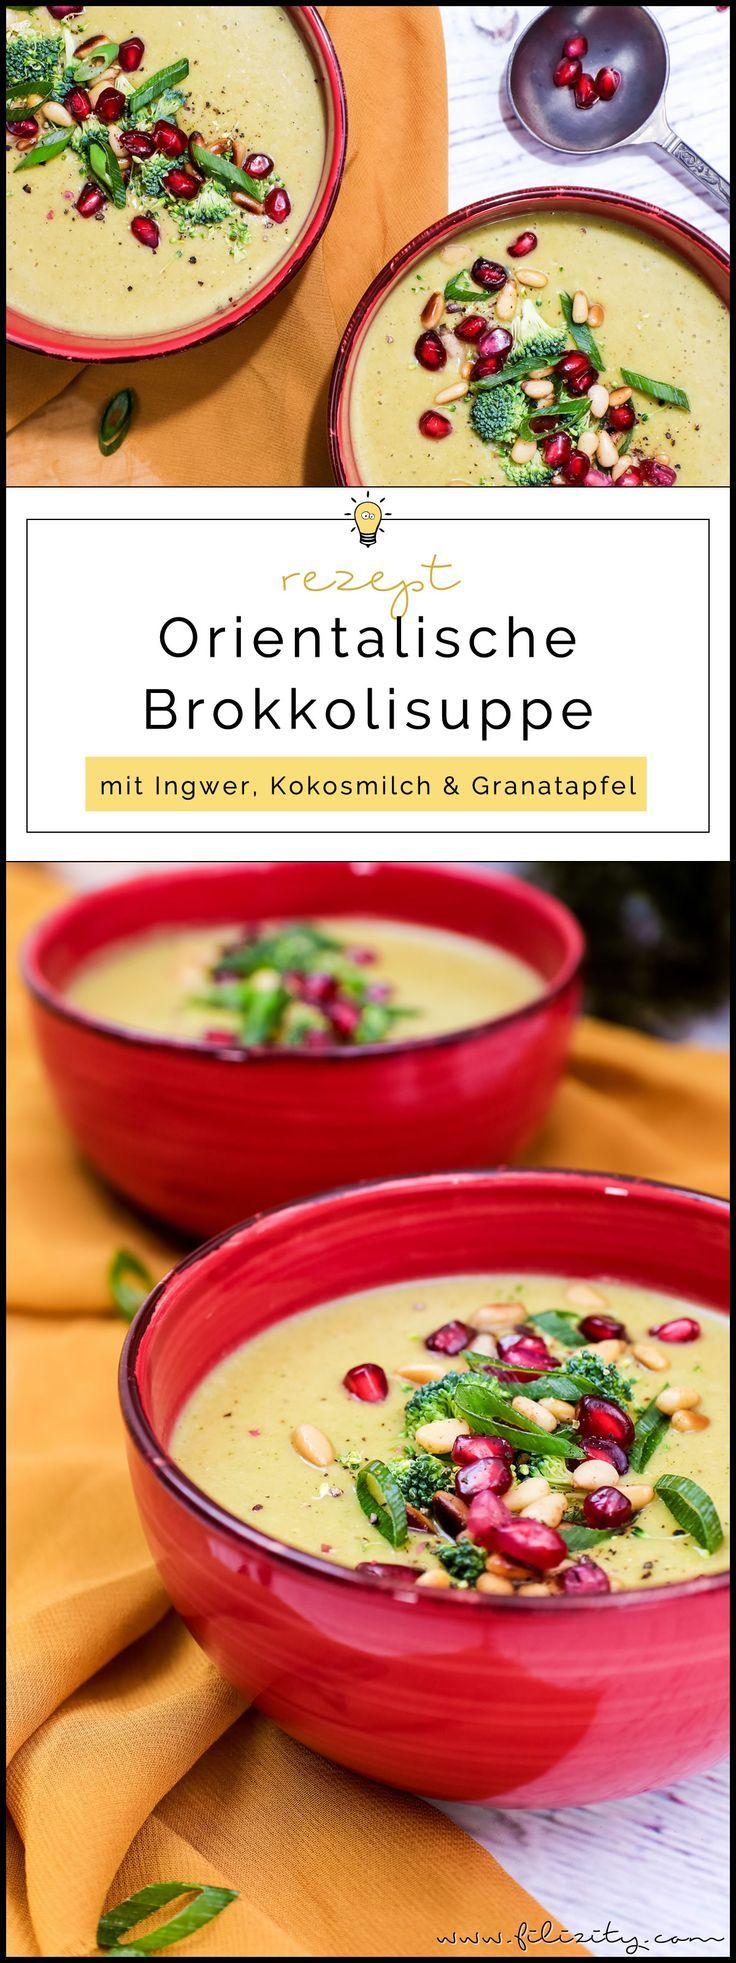 Orientalische Brokkoli-Suppe mit Kokos